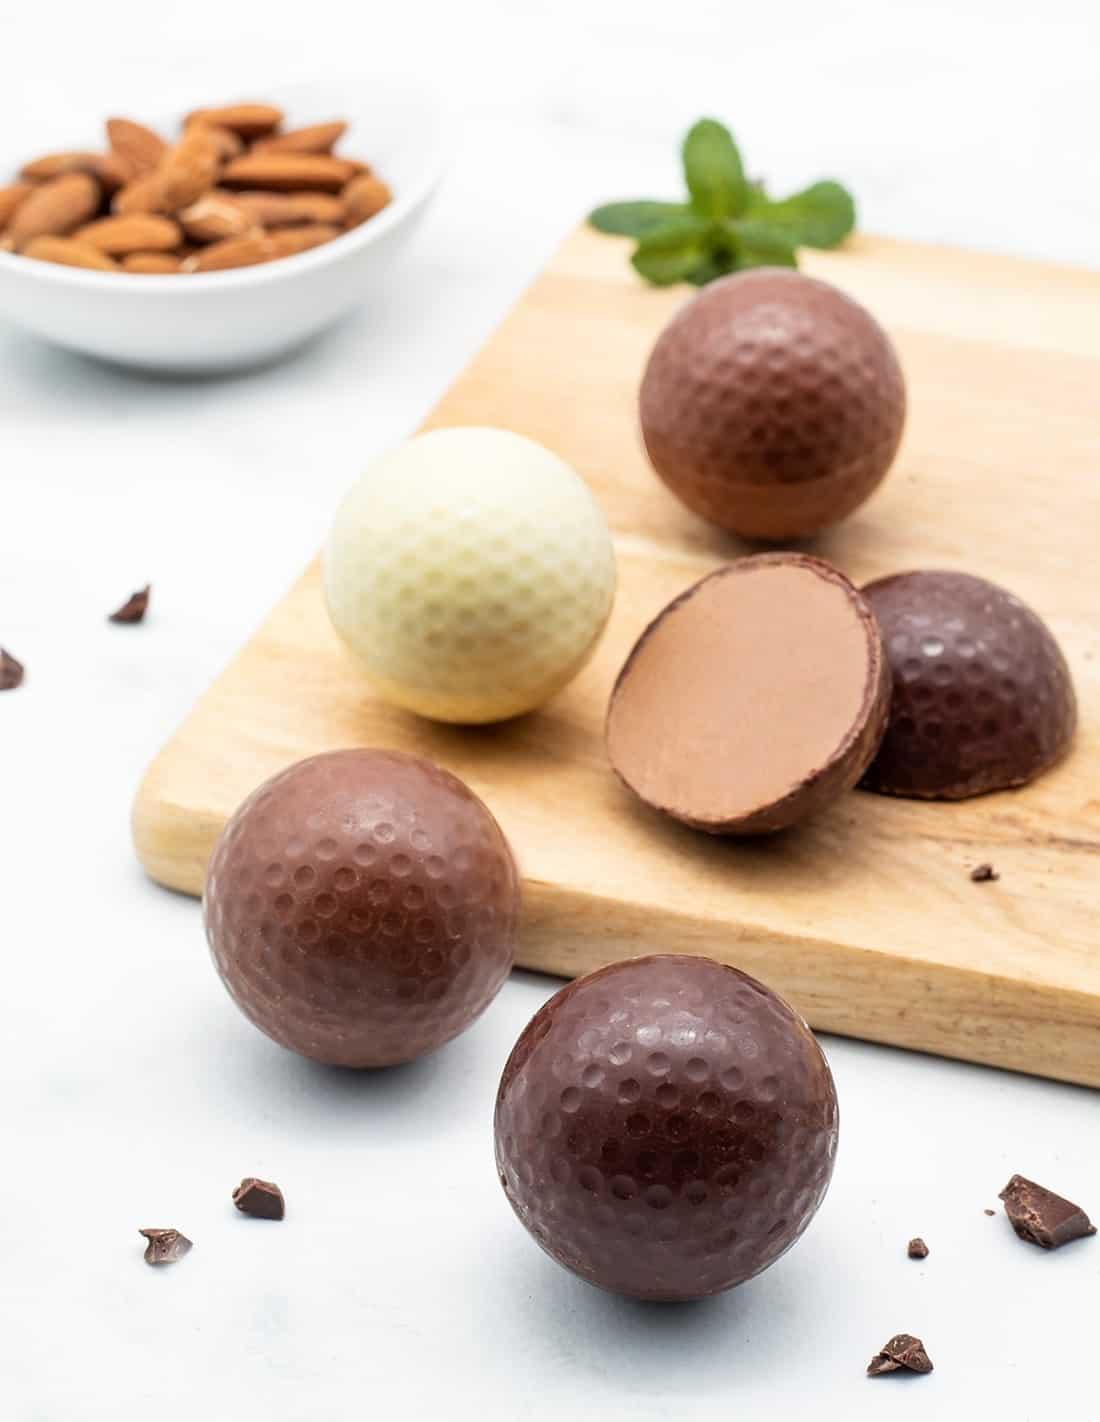 Golf balls - Set of 3